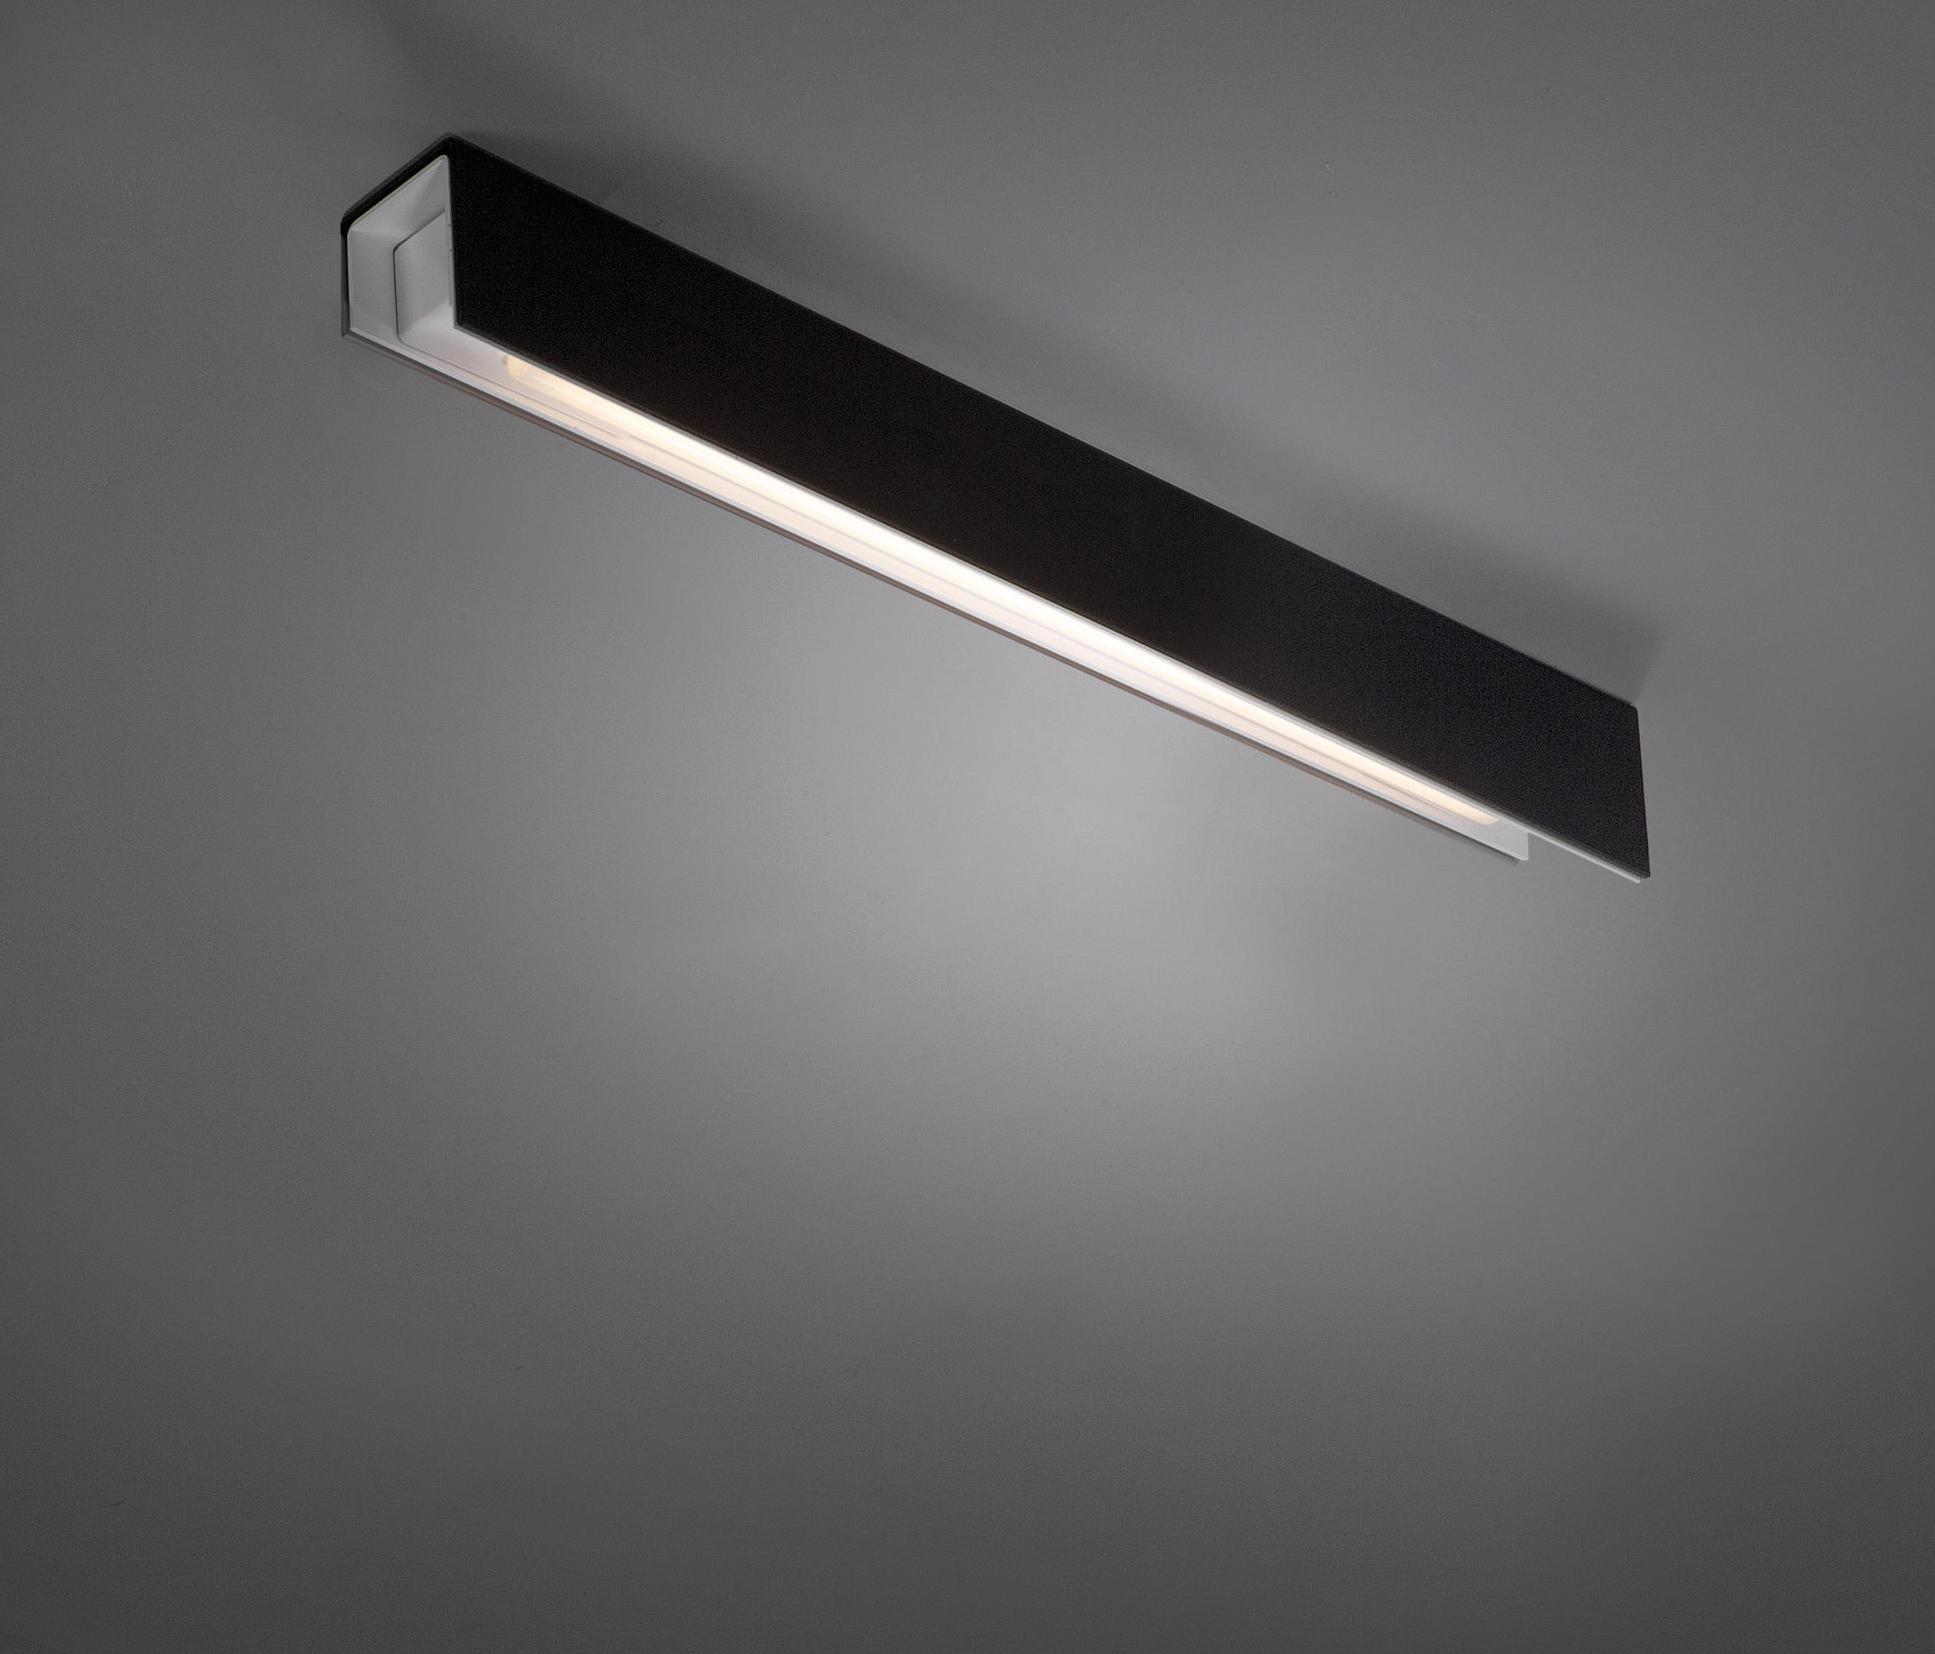 UNITED ASY 1X 21/39W GI - Ceiling lights from Modular Lighting ...